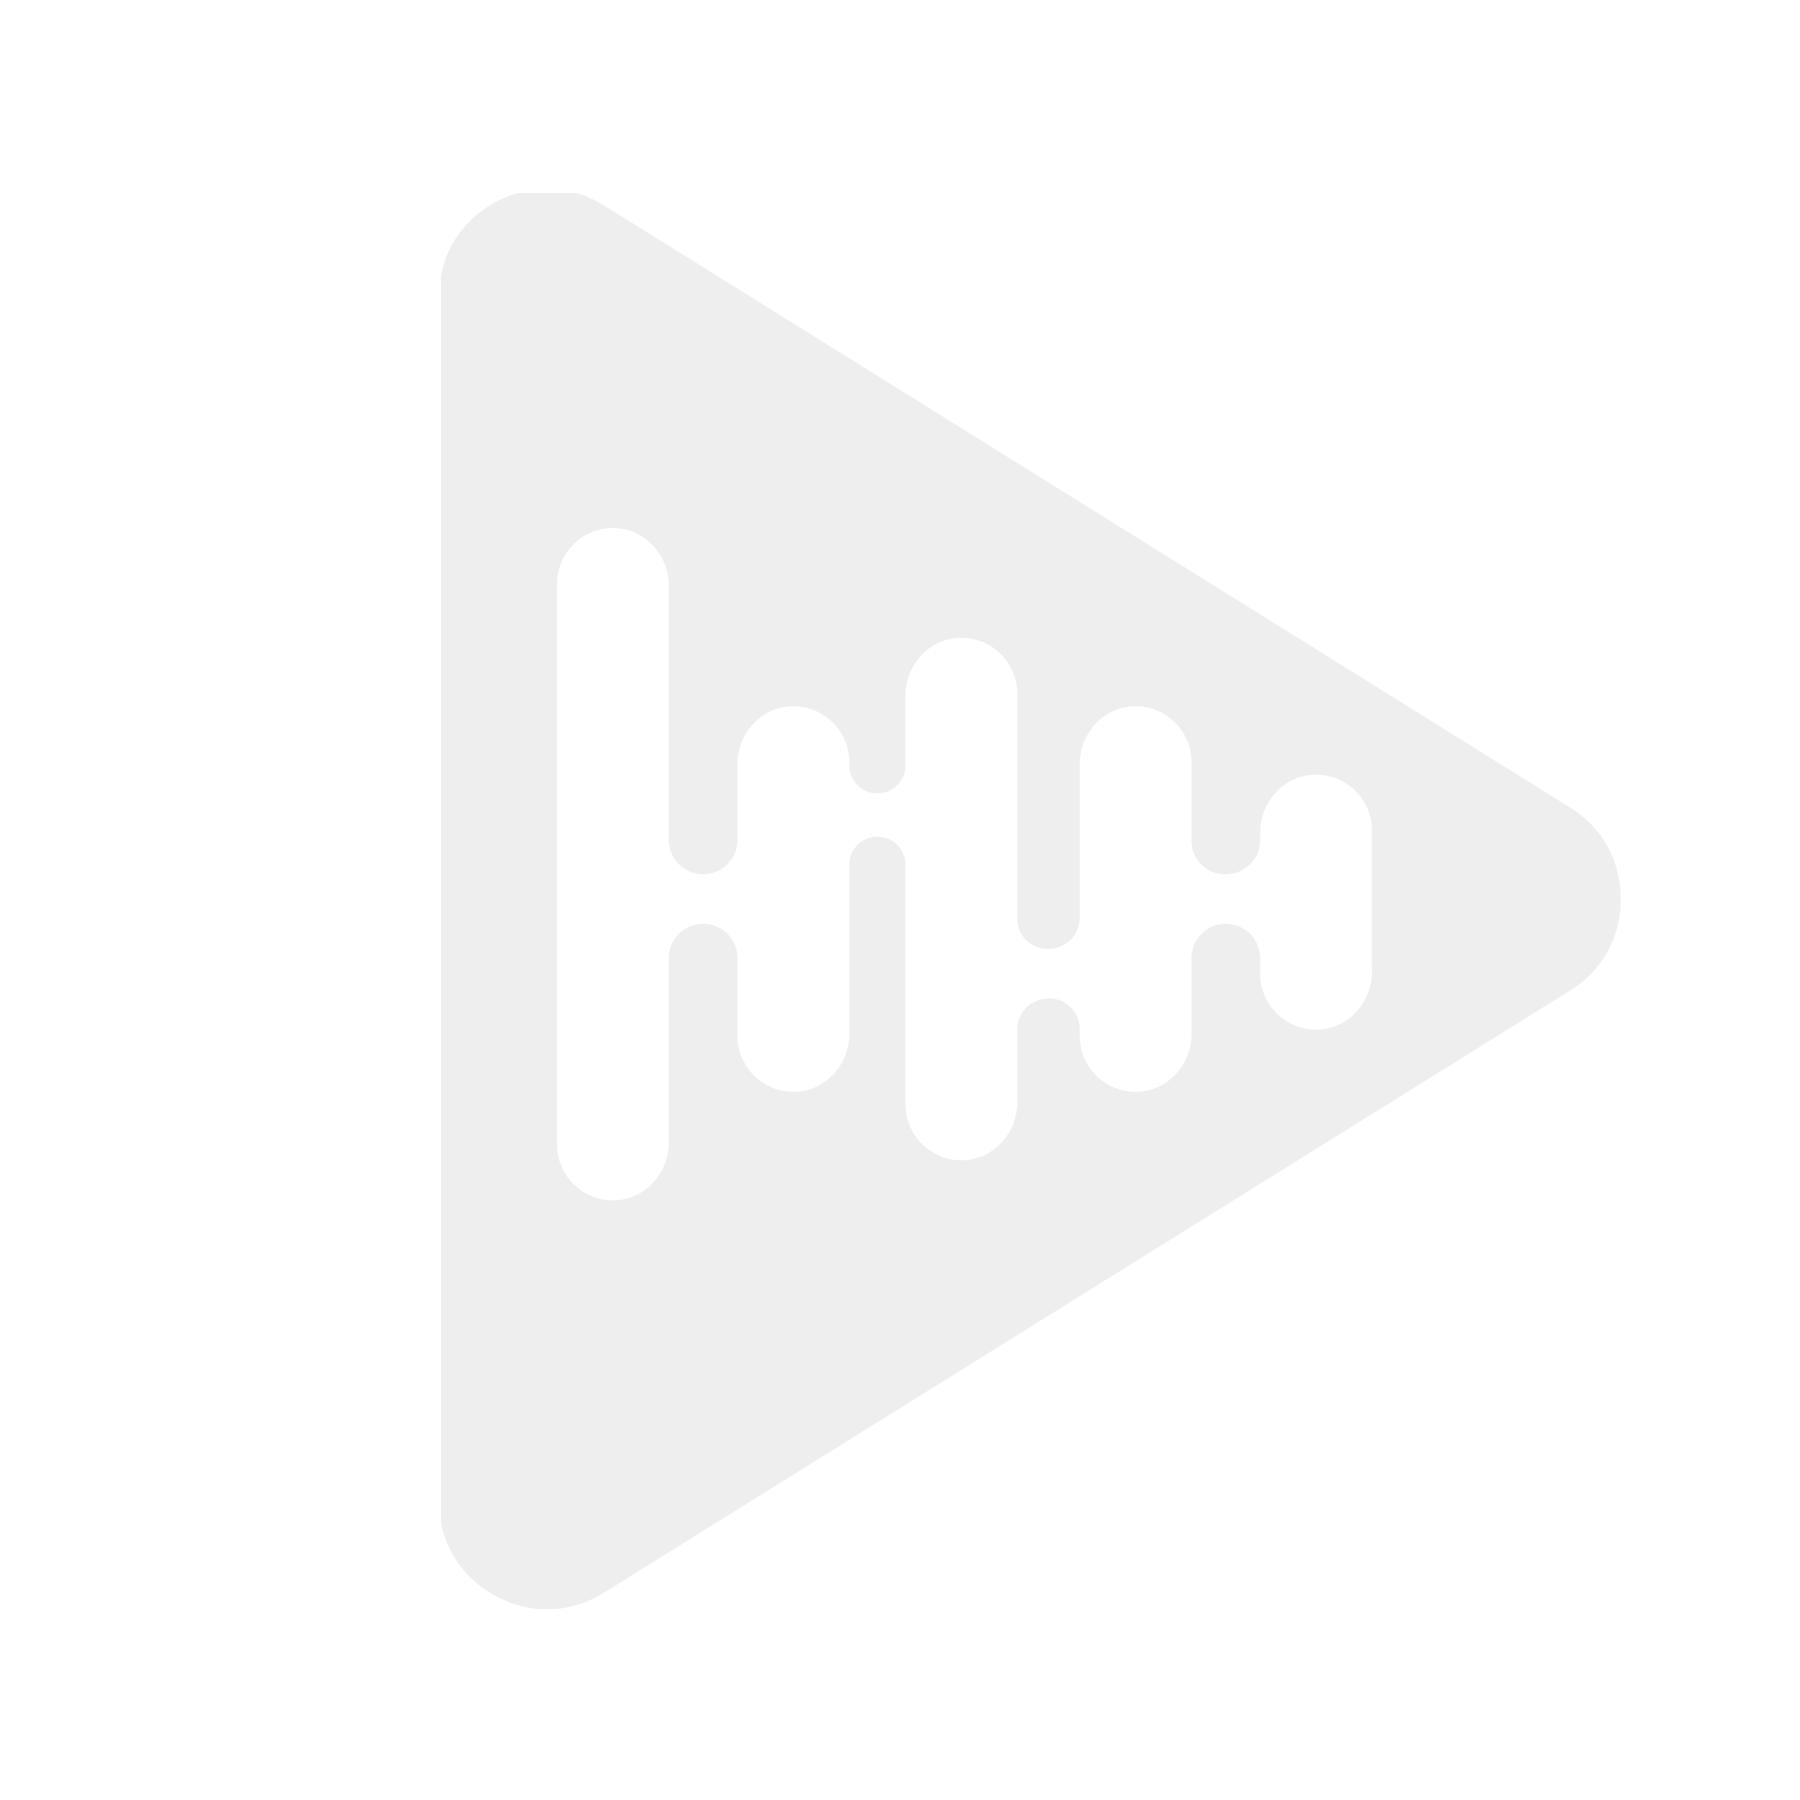 Pioneer AVH-Z7000DAB - 1-DIN CD/Radio, BT, CarPlay, Android Auto, DAB+